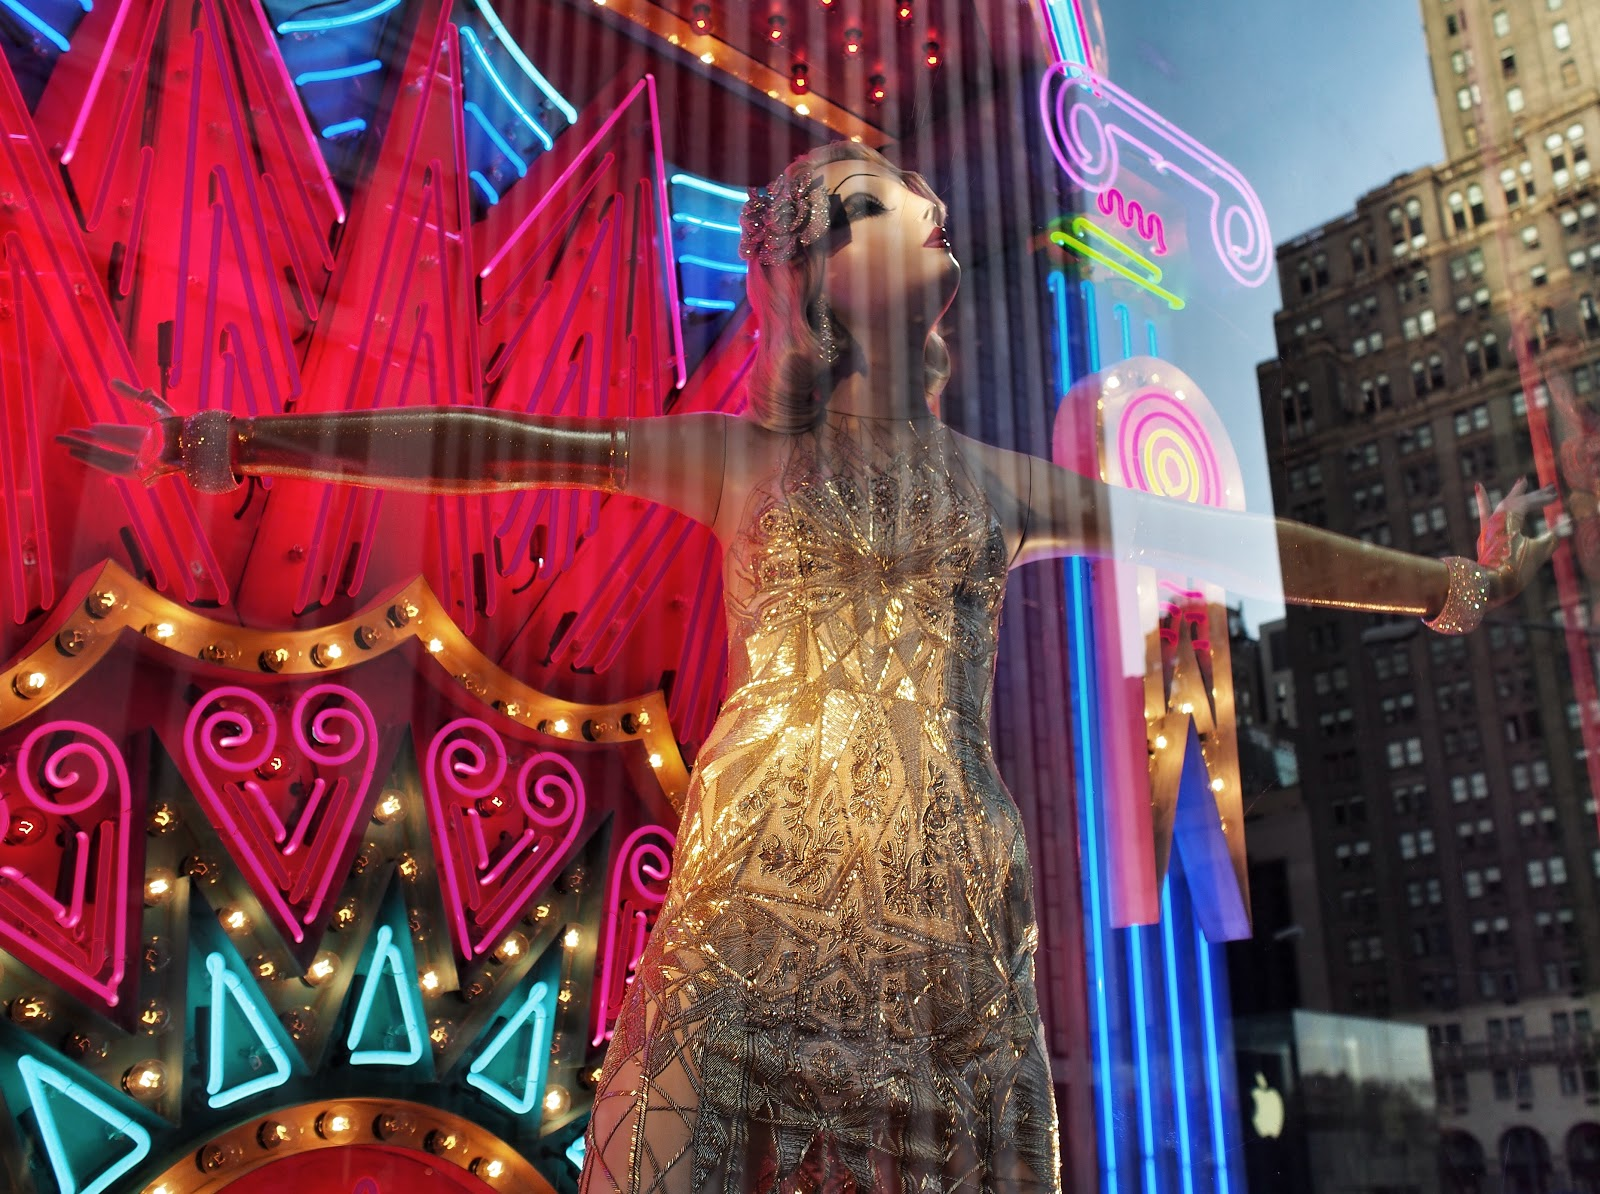 Step Aside GM Building, I'm the Star of this Show #StepAsideGMBuilding #bgwindows #windowwatchers #holidaywindows #5thavenuewindows #NYC  #holidays #besttimeoftheyear #nyc ©2014 Nancy Lundebjerg